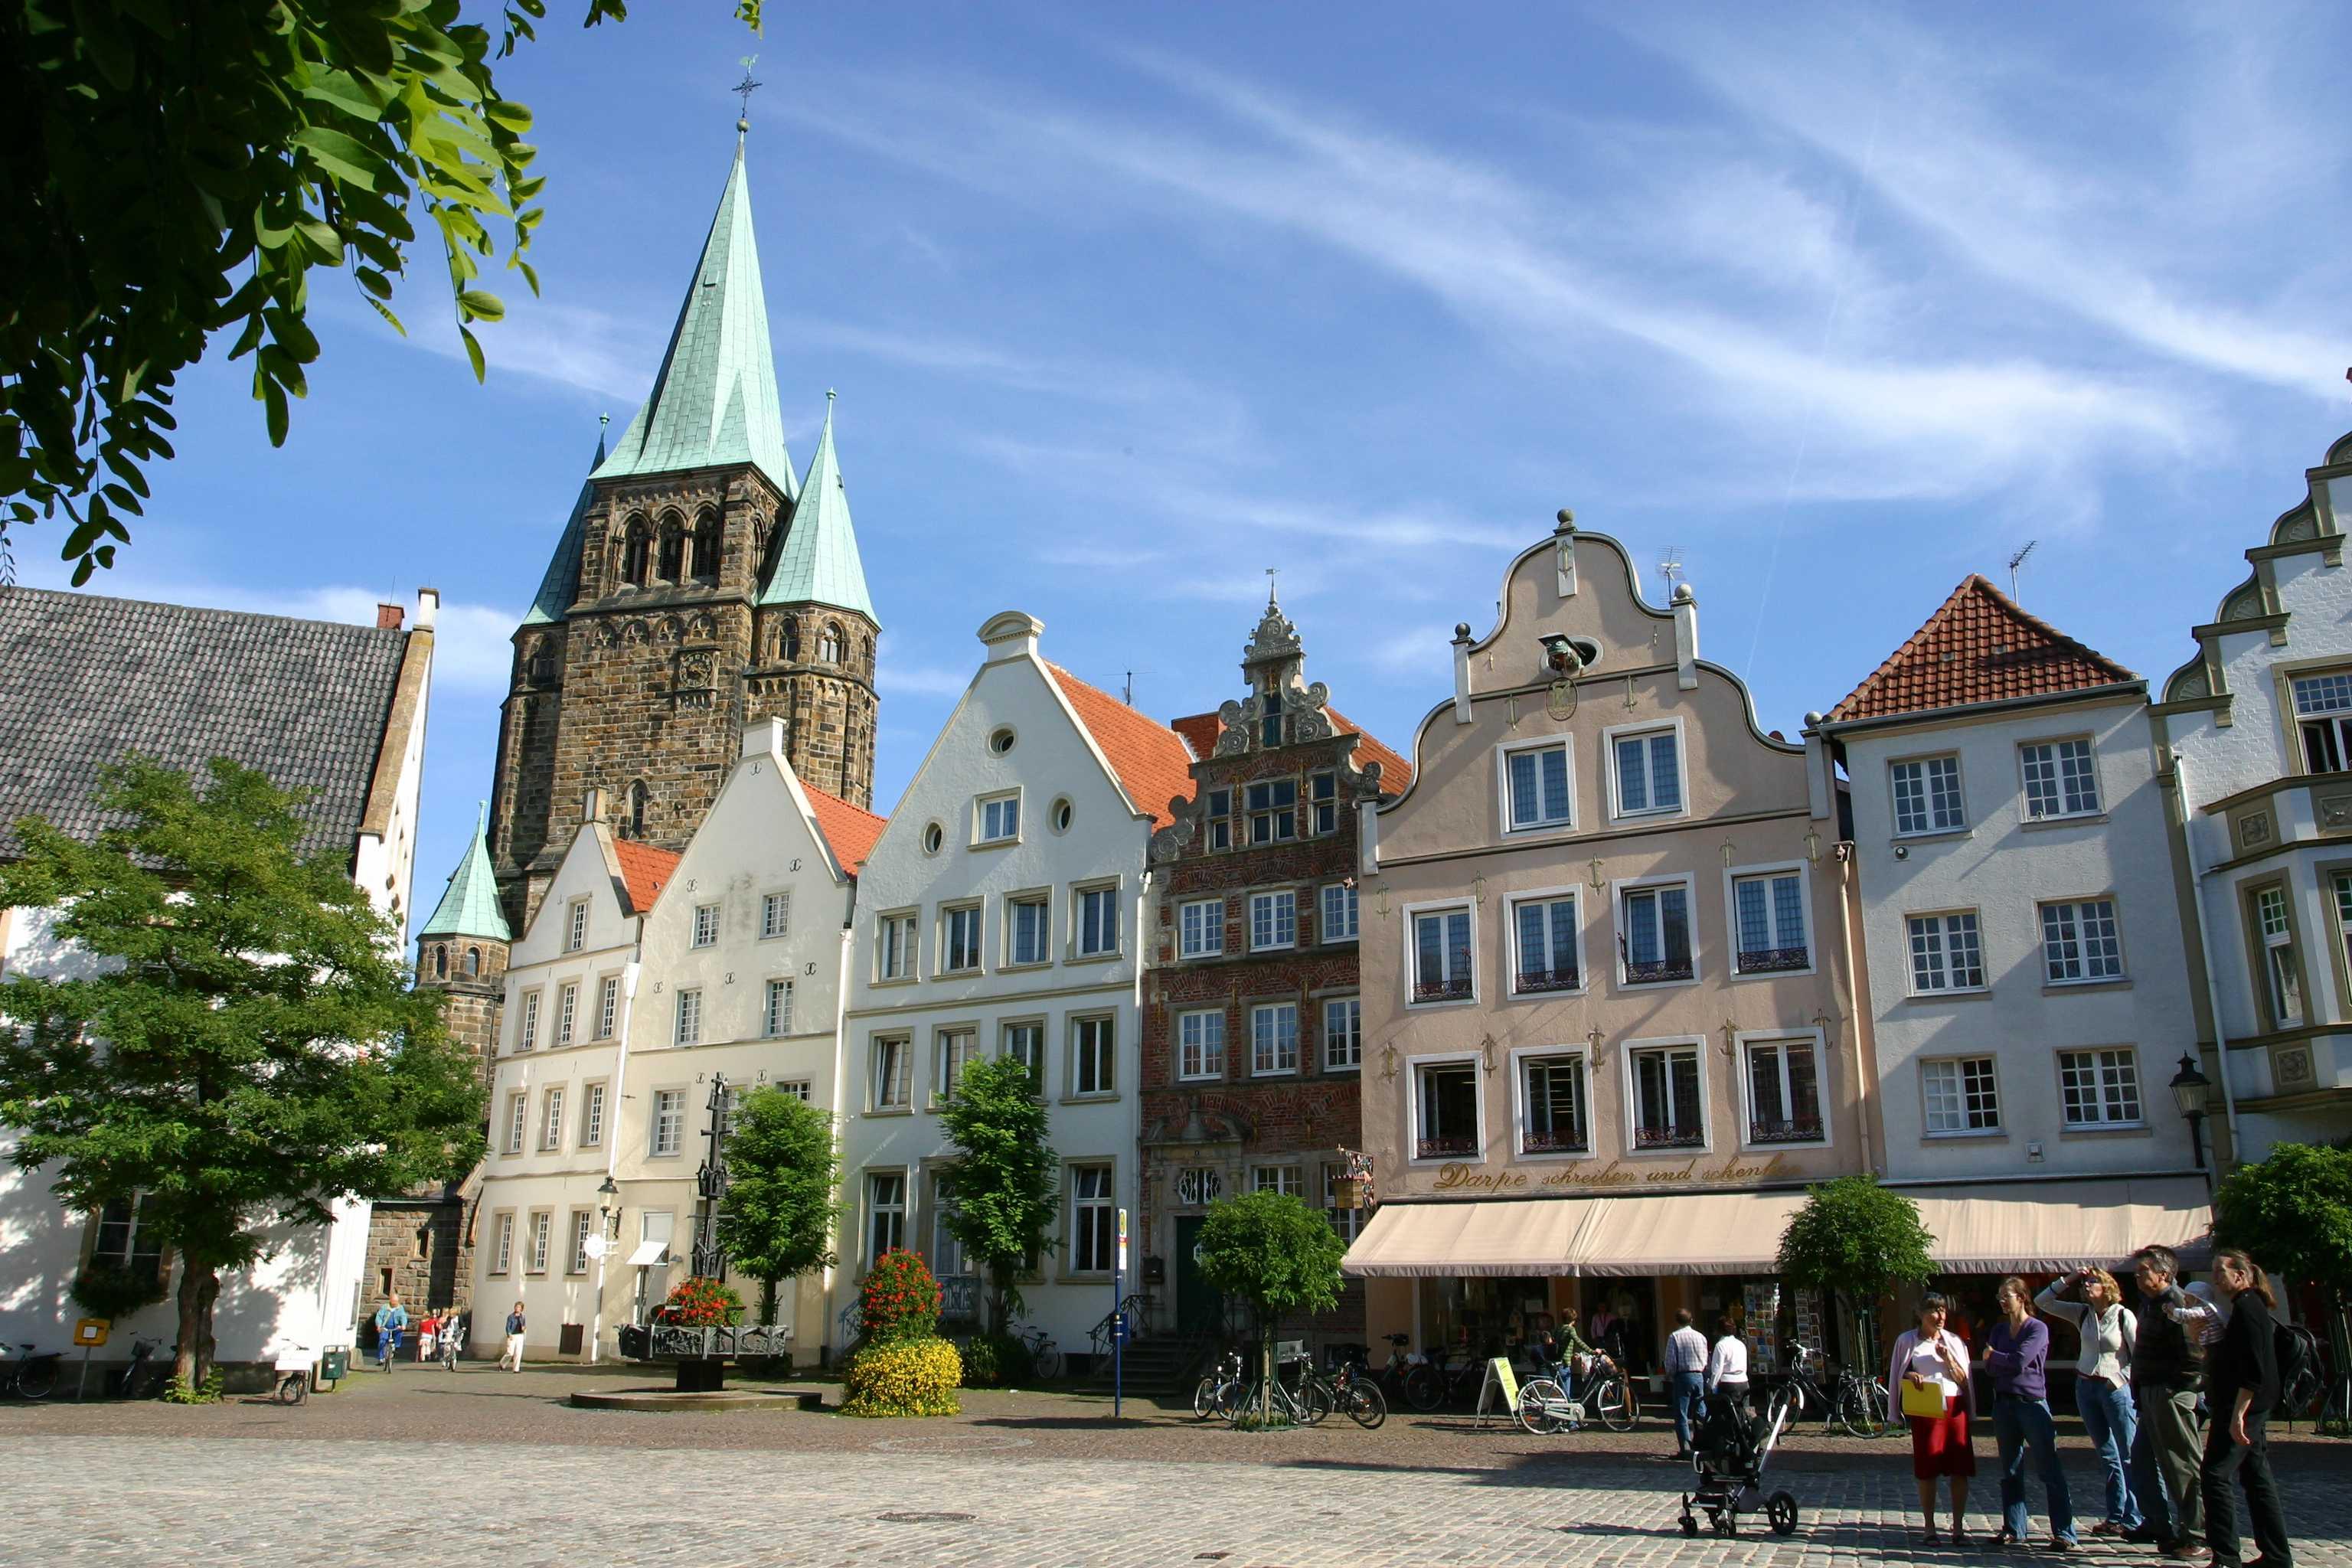 Hotel Pension Warendorf